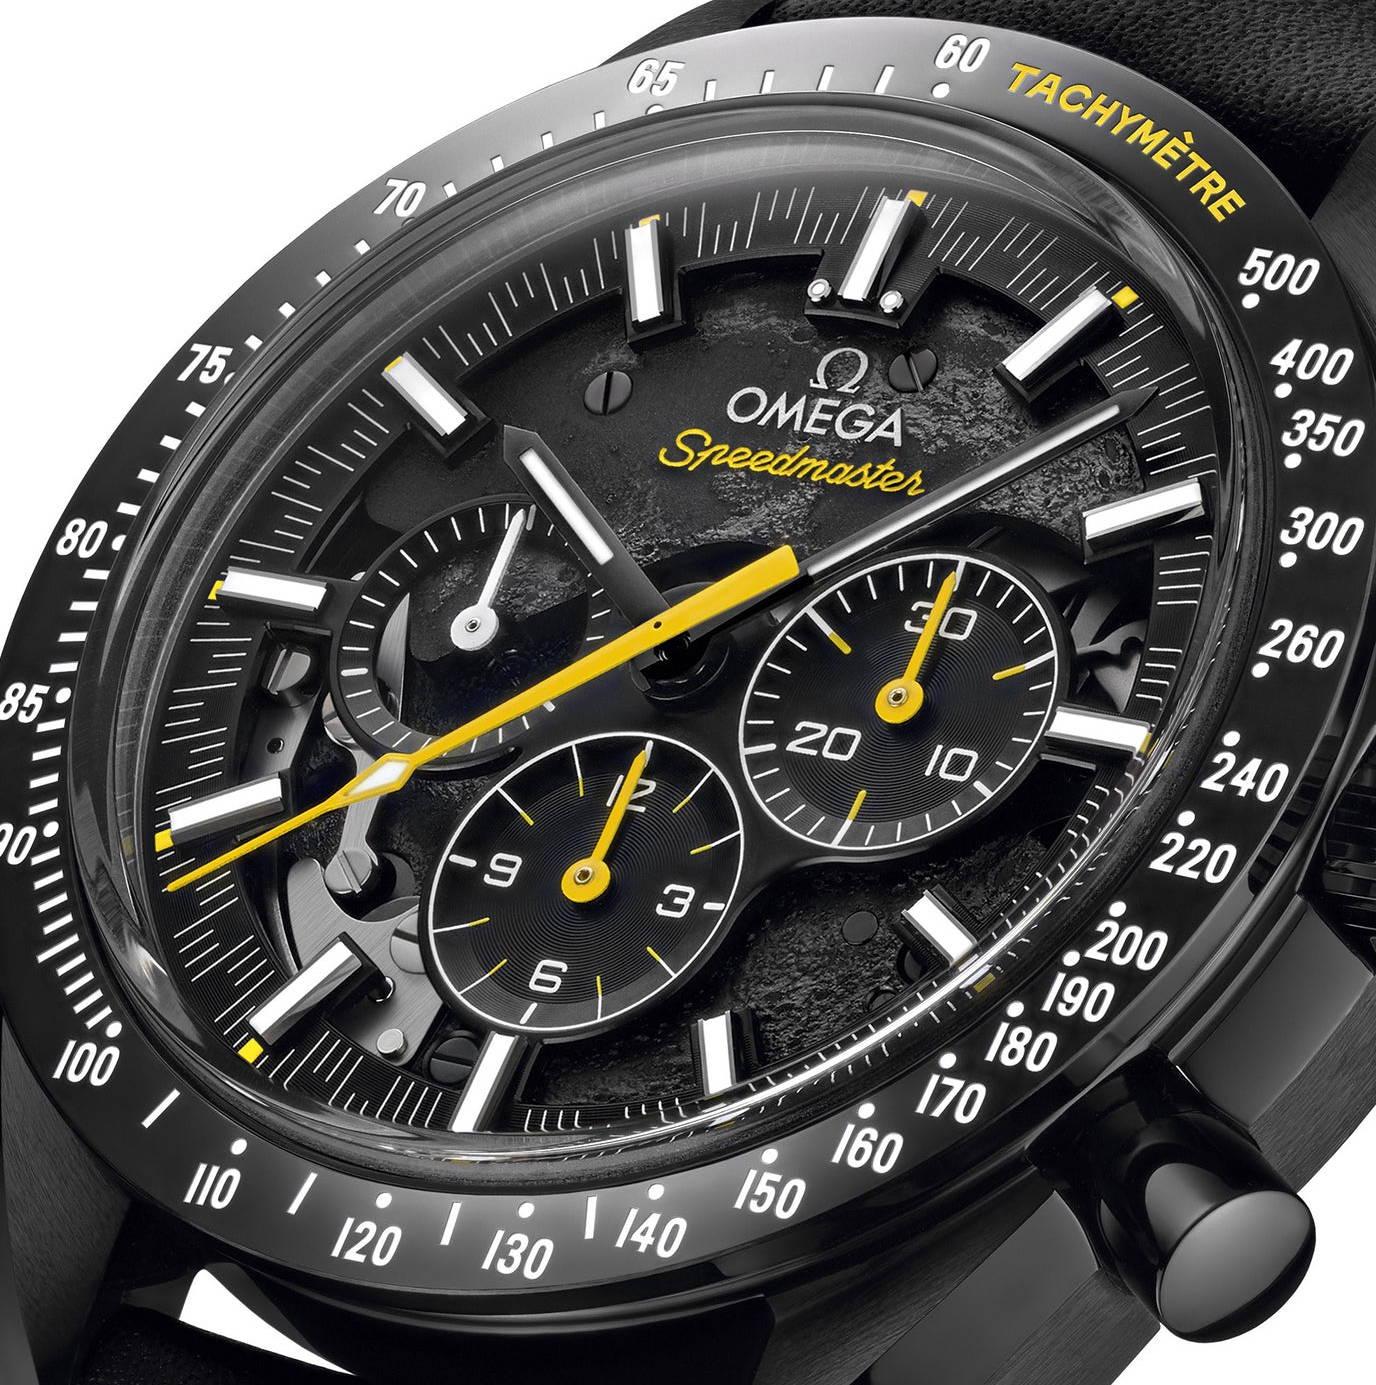 Omega Dark Side of the Moon Apollo 8 Timepiece